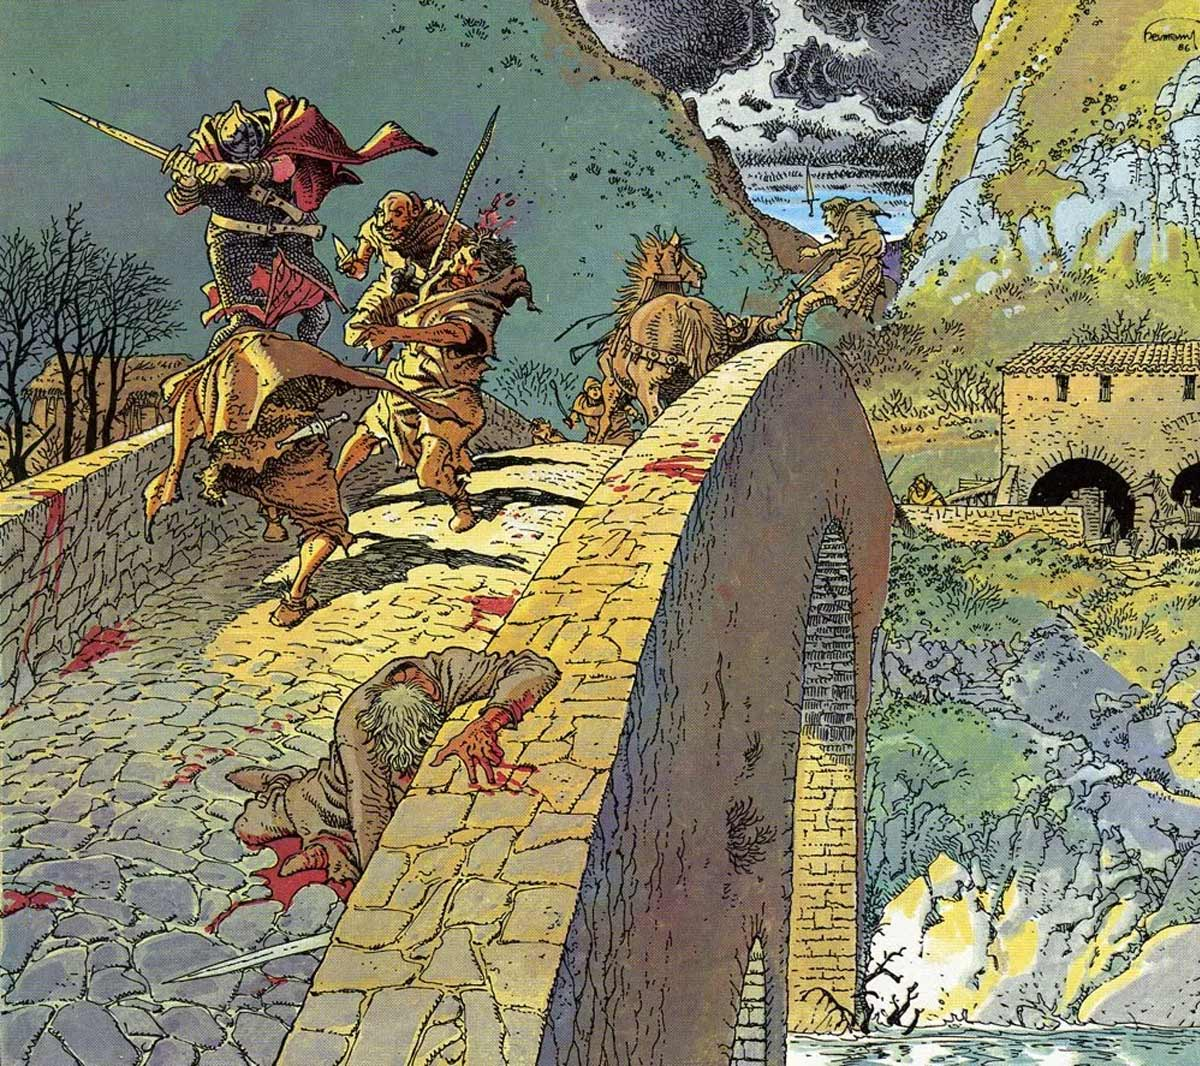 Golem-Comics-resena-las-torres-de-bois-mauri-maury-hermann-06